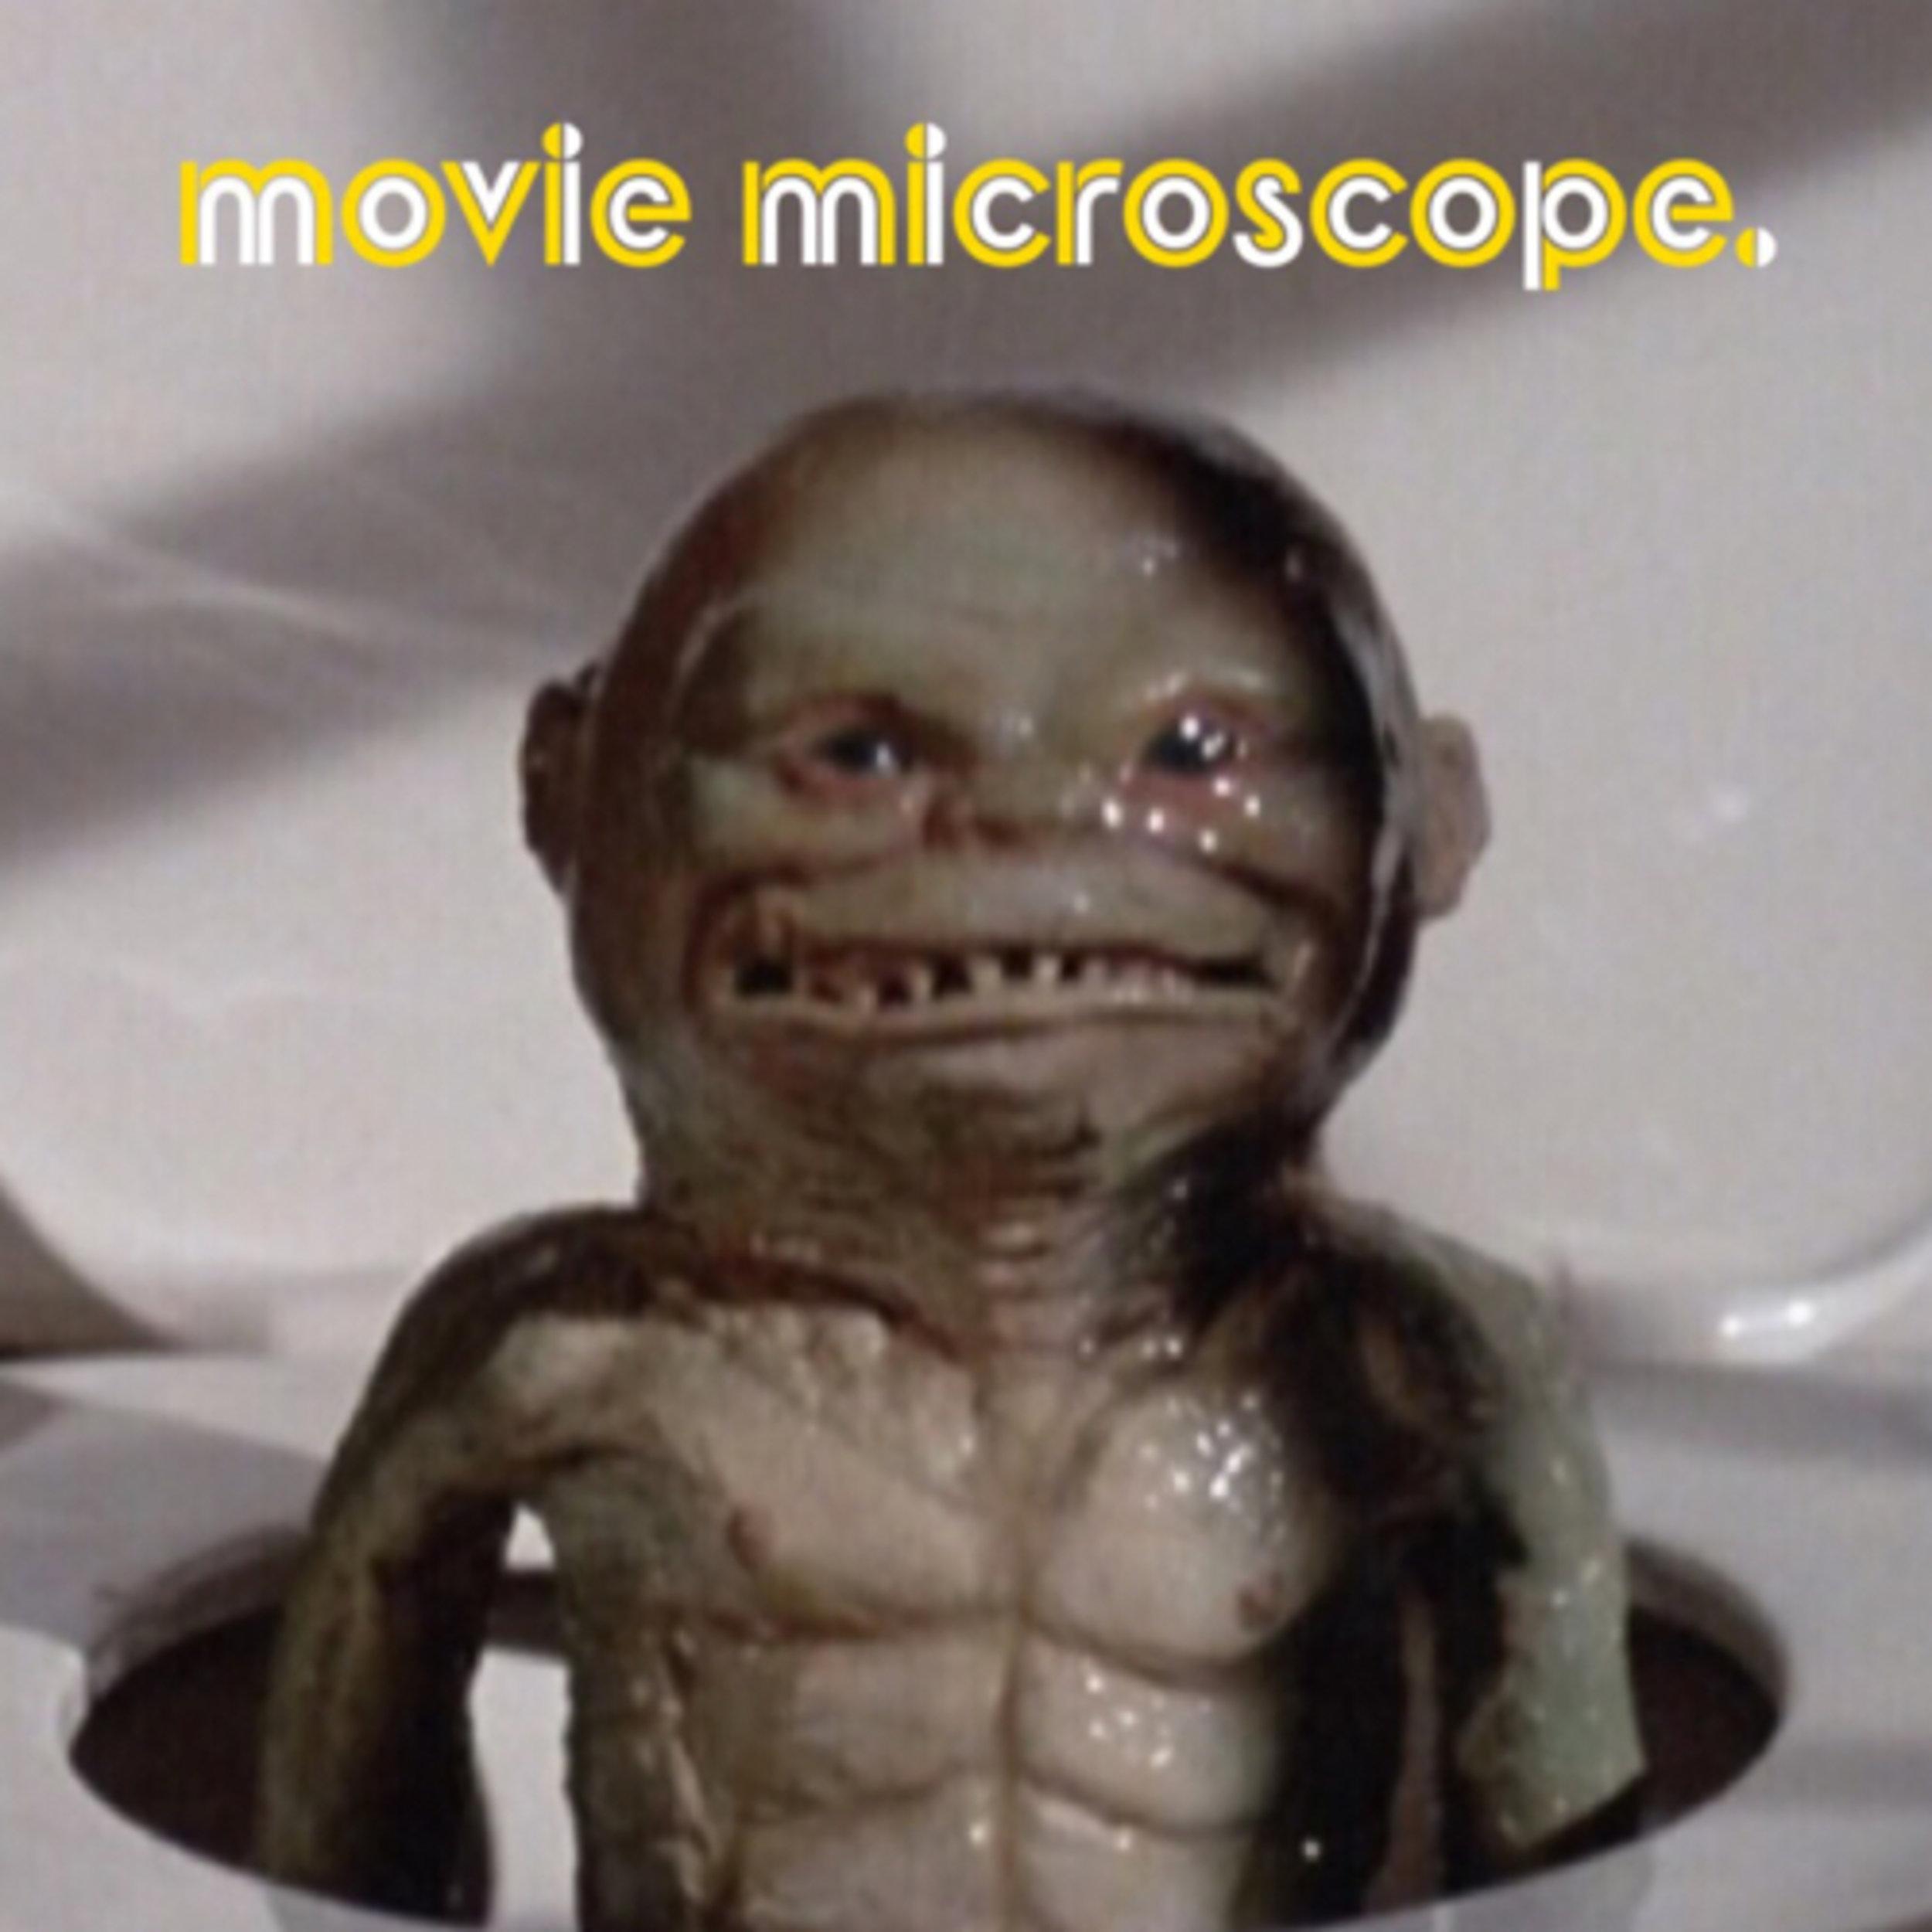 moviemicroscope.jpg